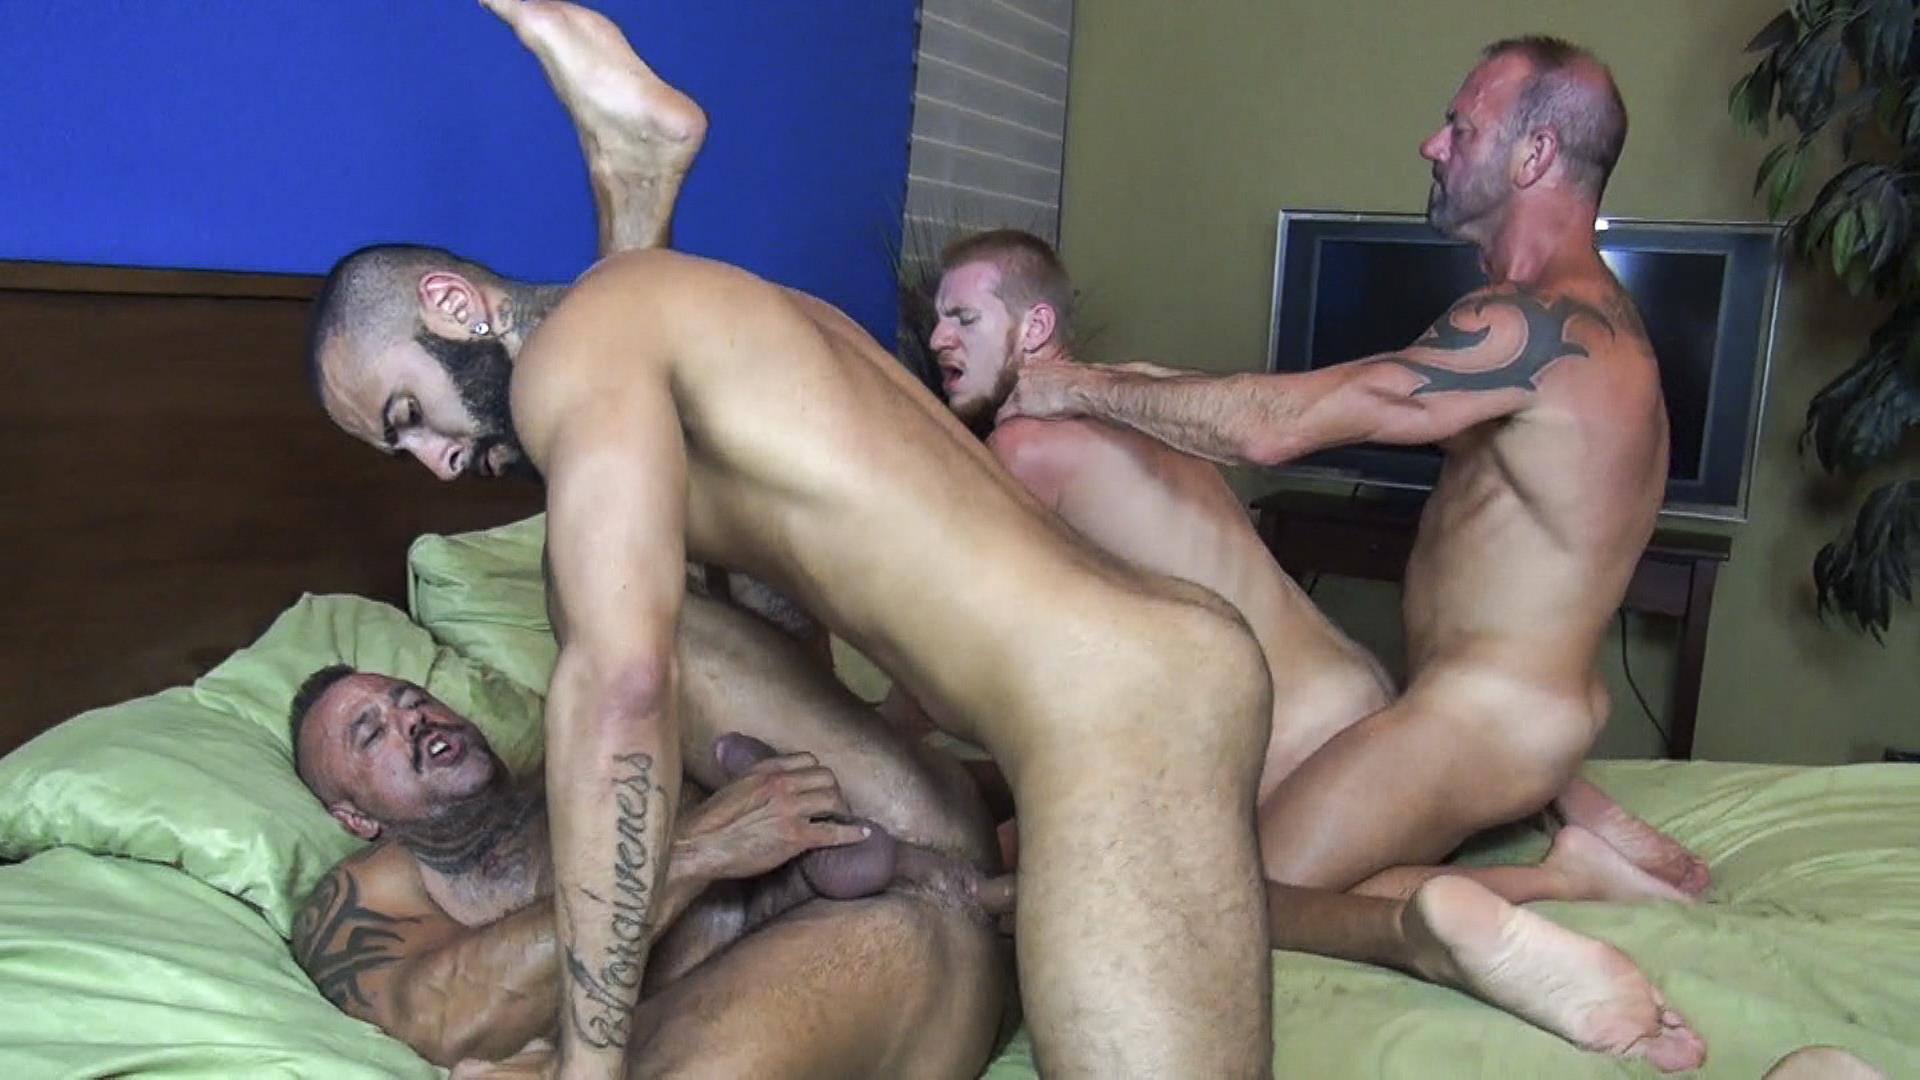 bear chuby gay orgy pornhub bareback